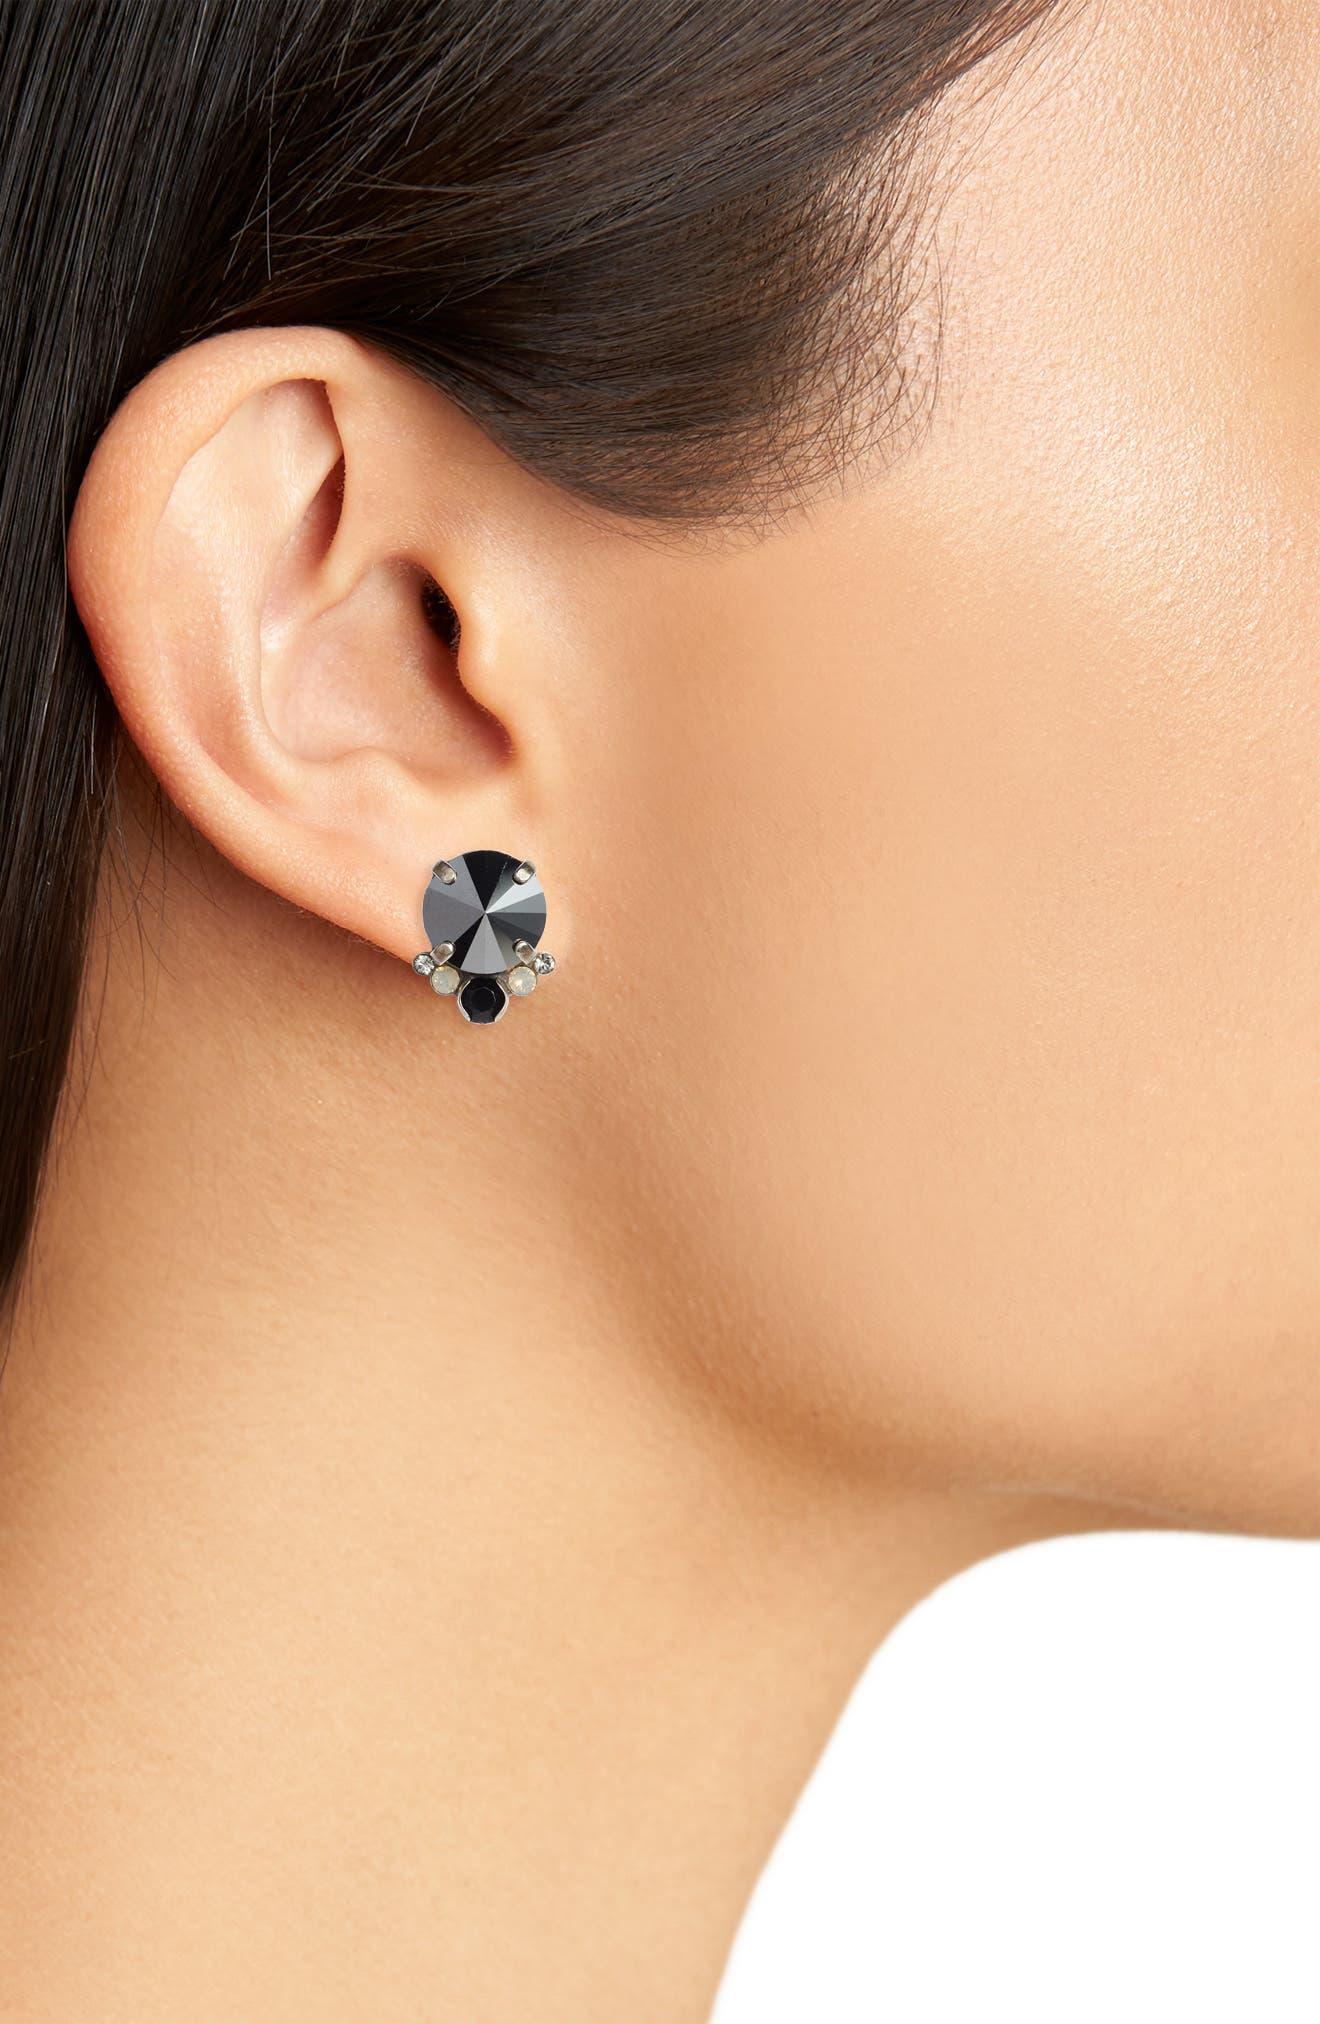 Regal Crystal Stud Earrings,                             Alternate thumbnail 2, color,                             Black